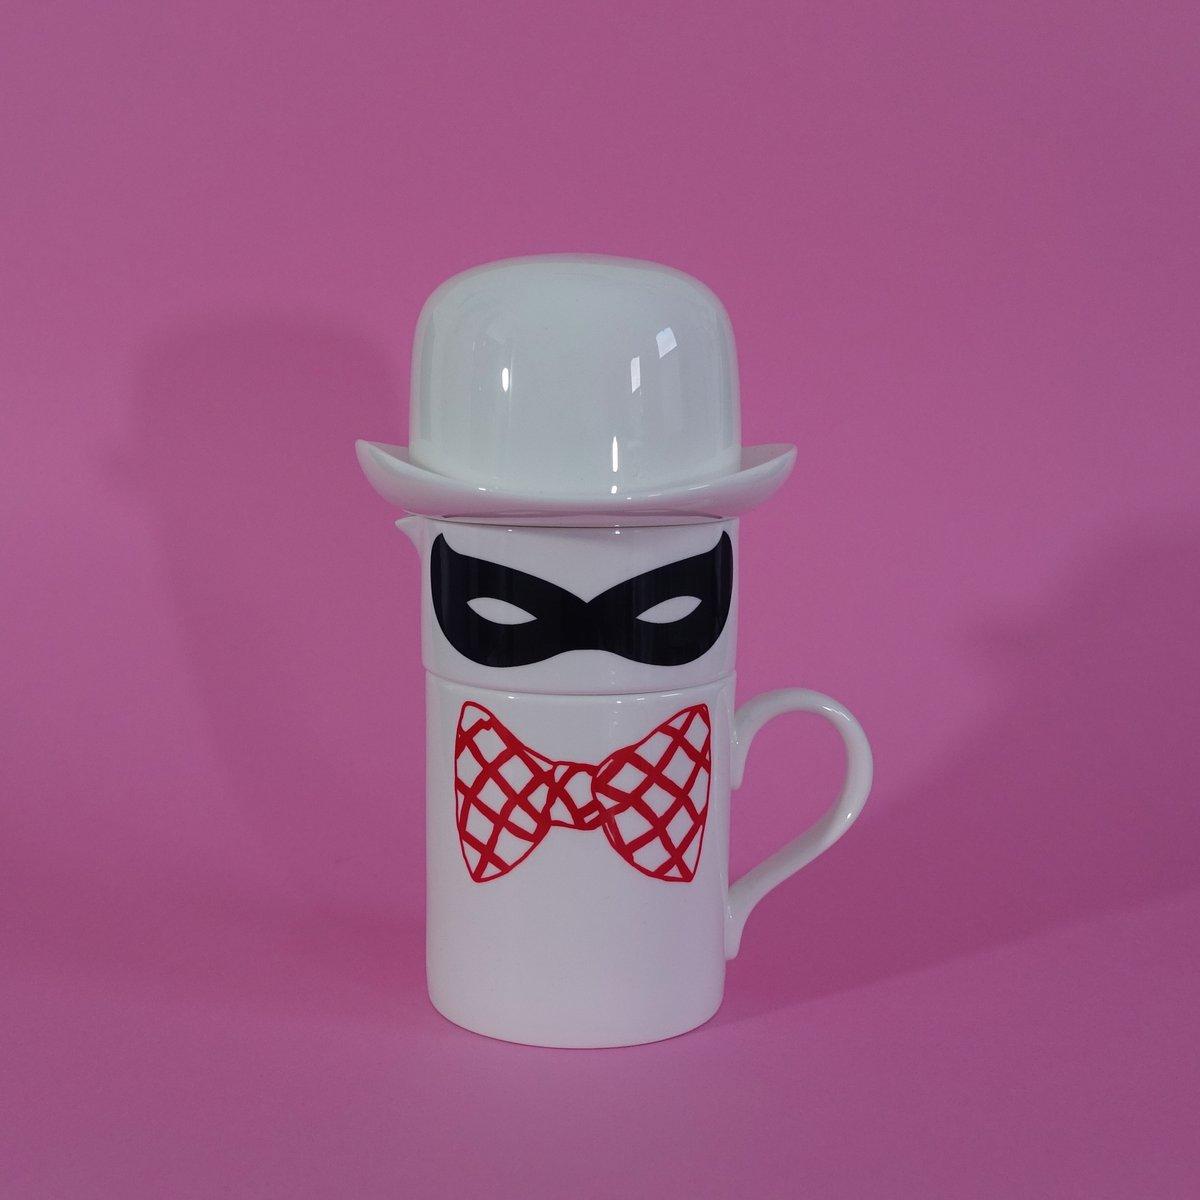 Image of Original Bow Tie Mug, Milk Jug and Sugar bowl set